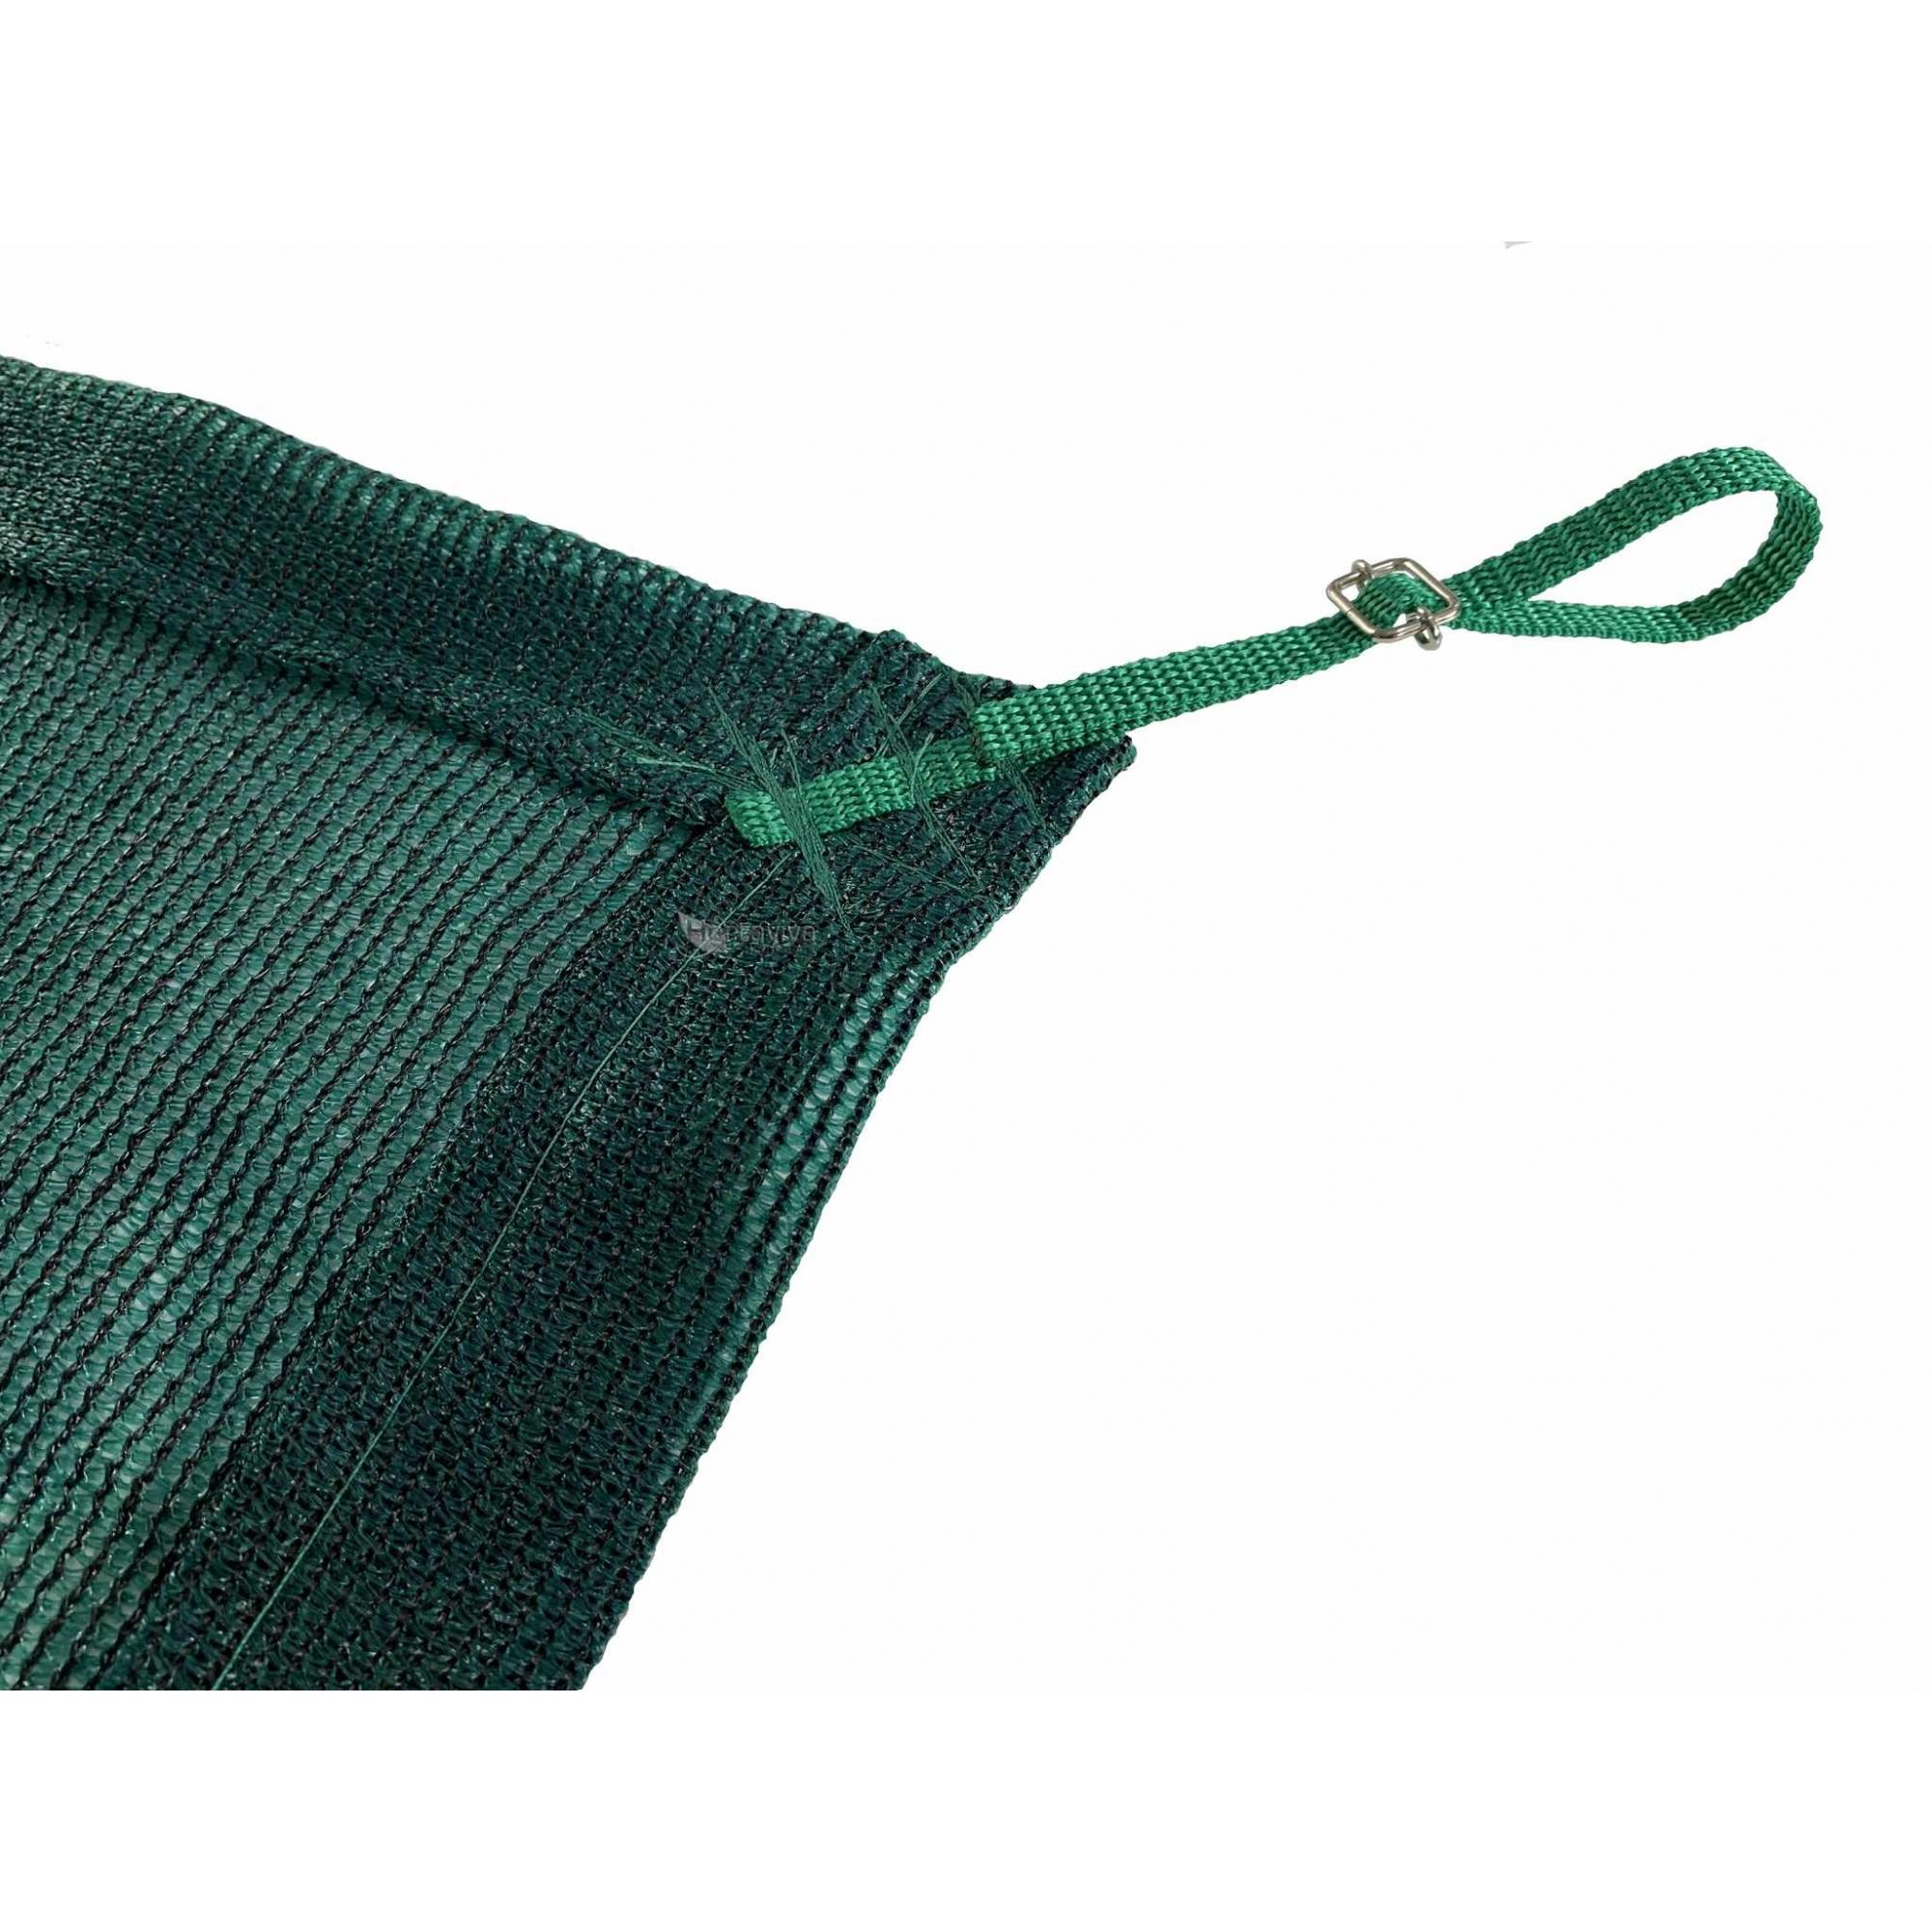 Tela de Sombreamento 80% Verde com Esticadores - Largura: 3,5 Metros